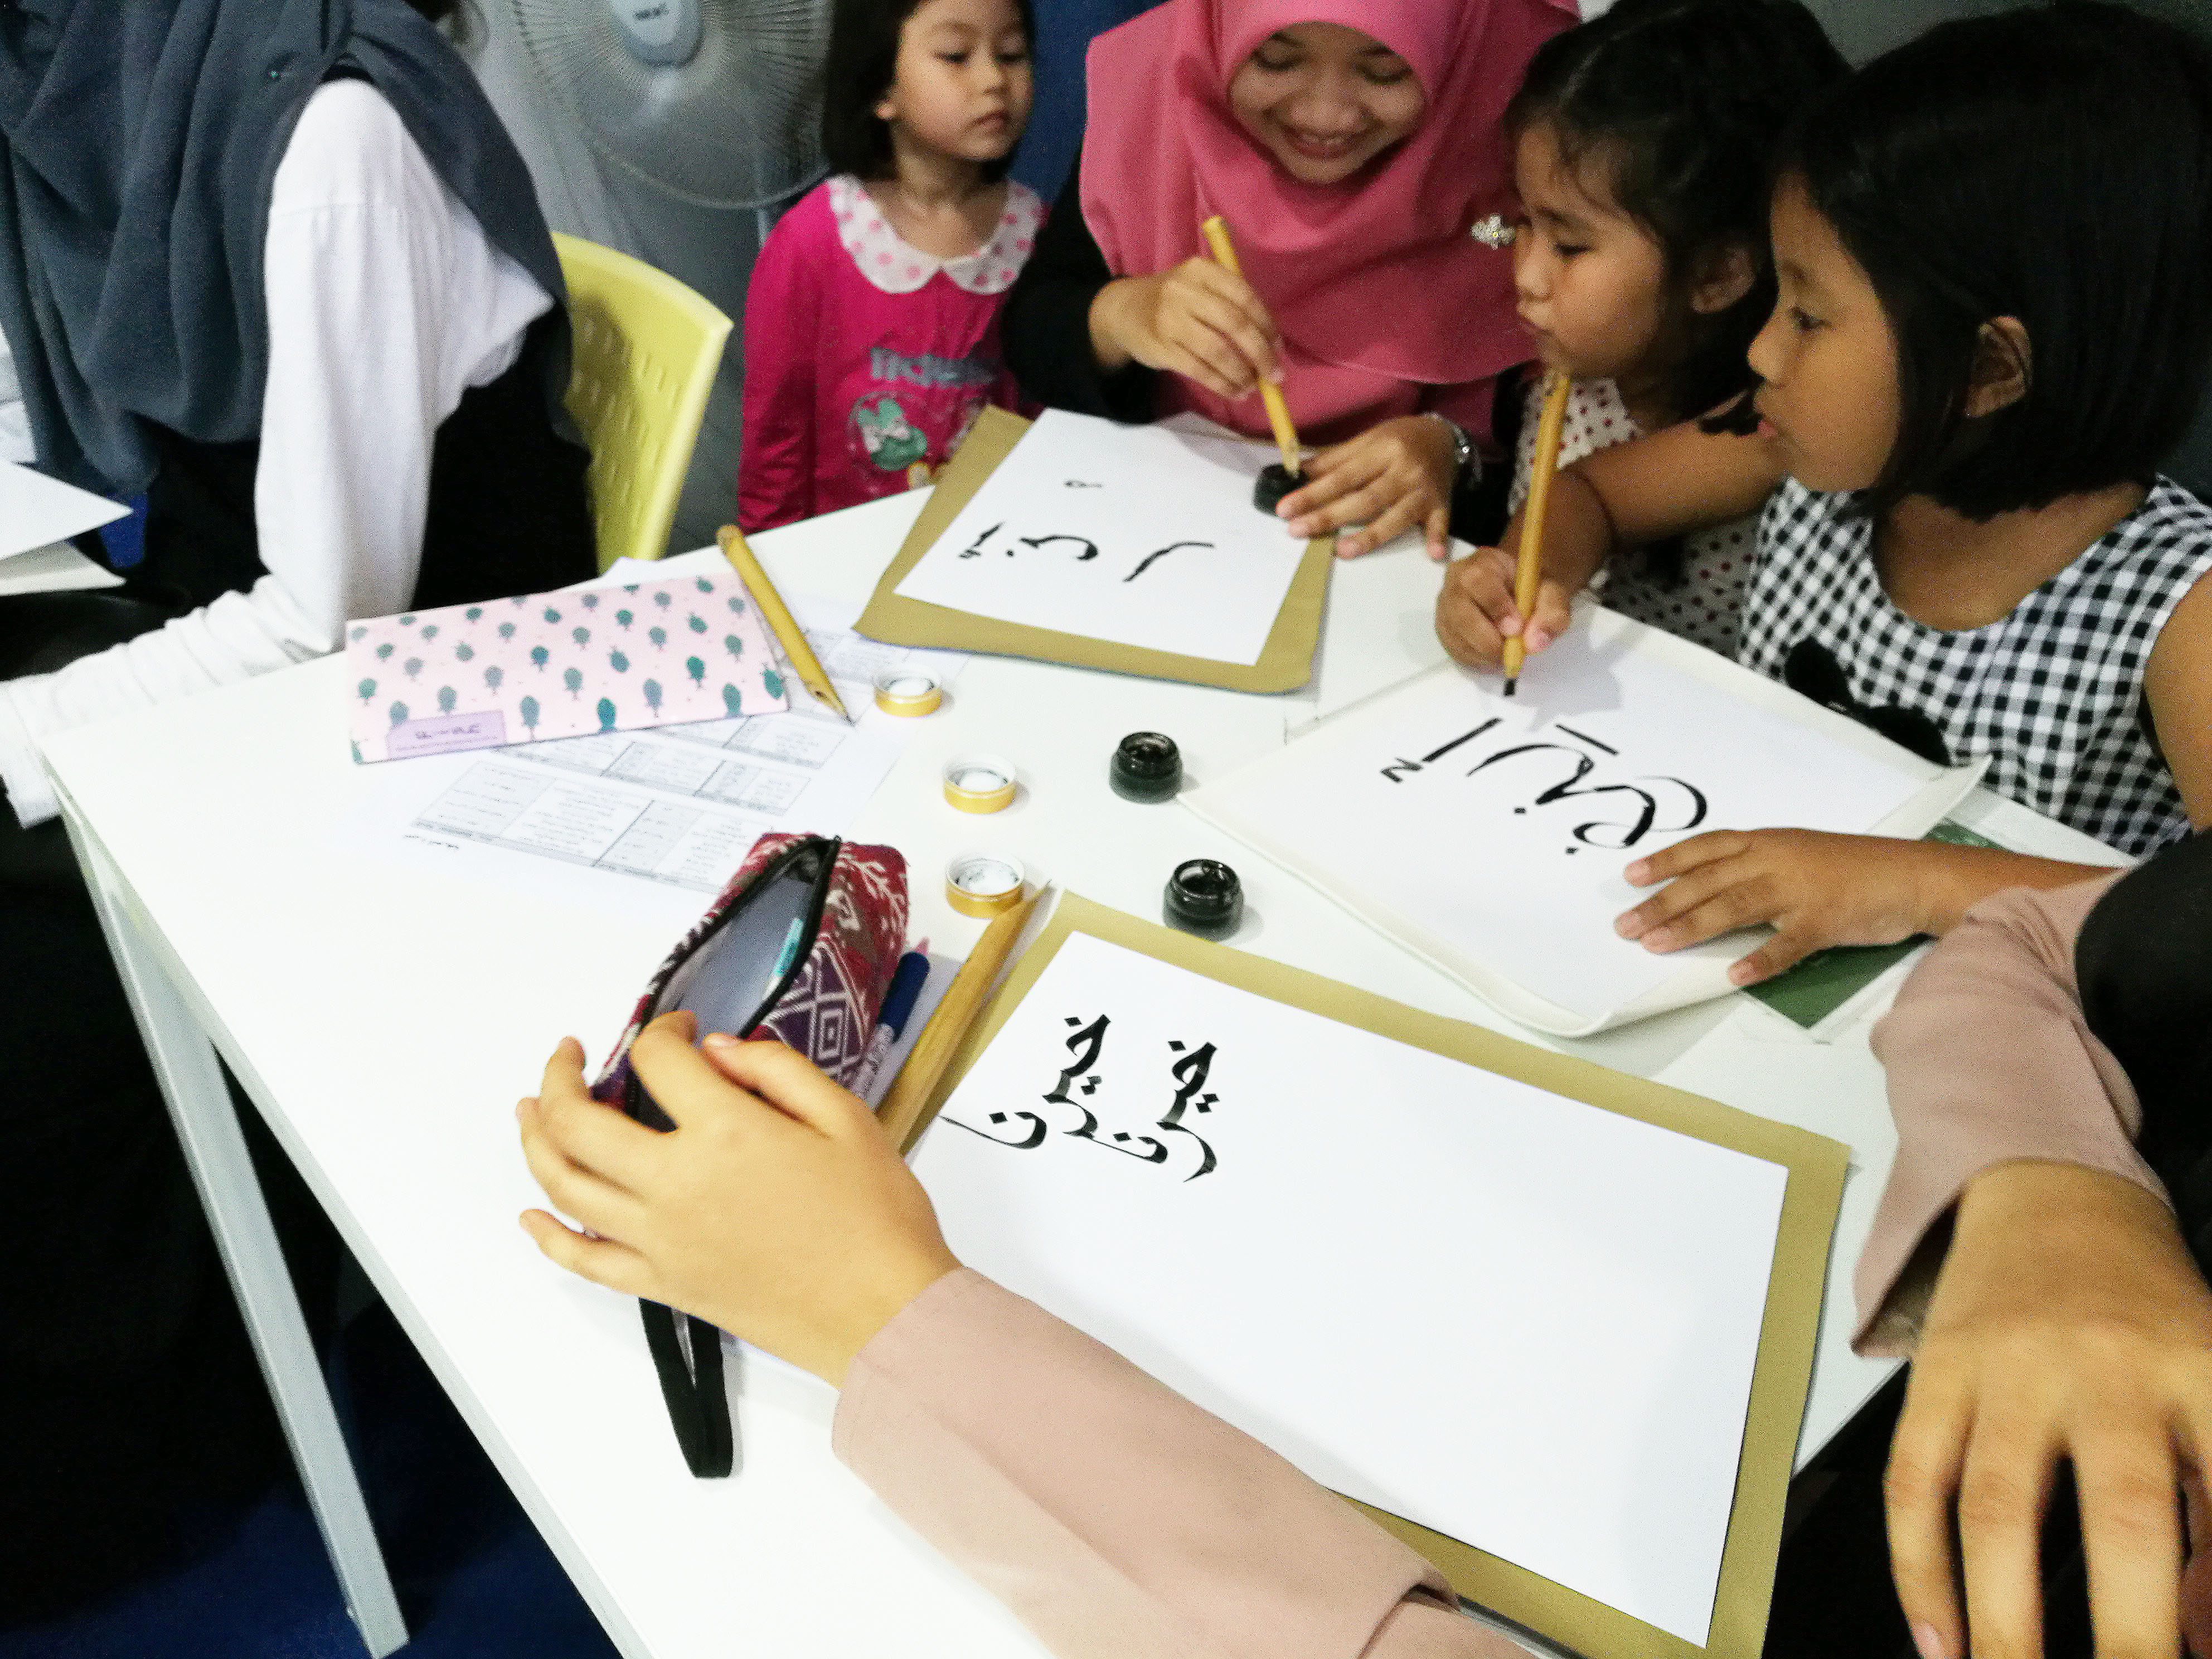 Islamic and Arabic calligraphy